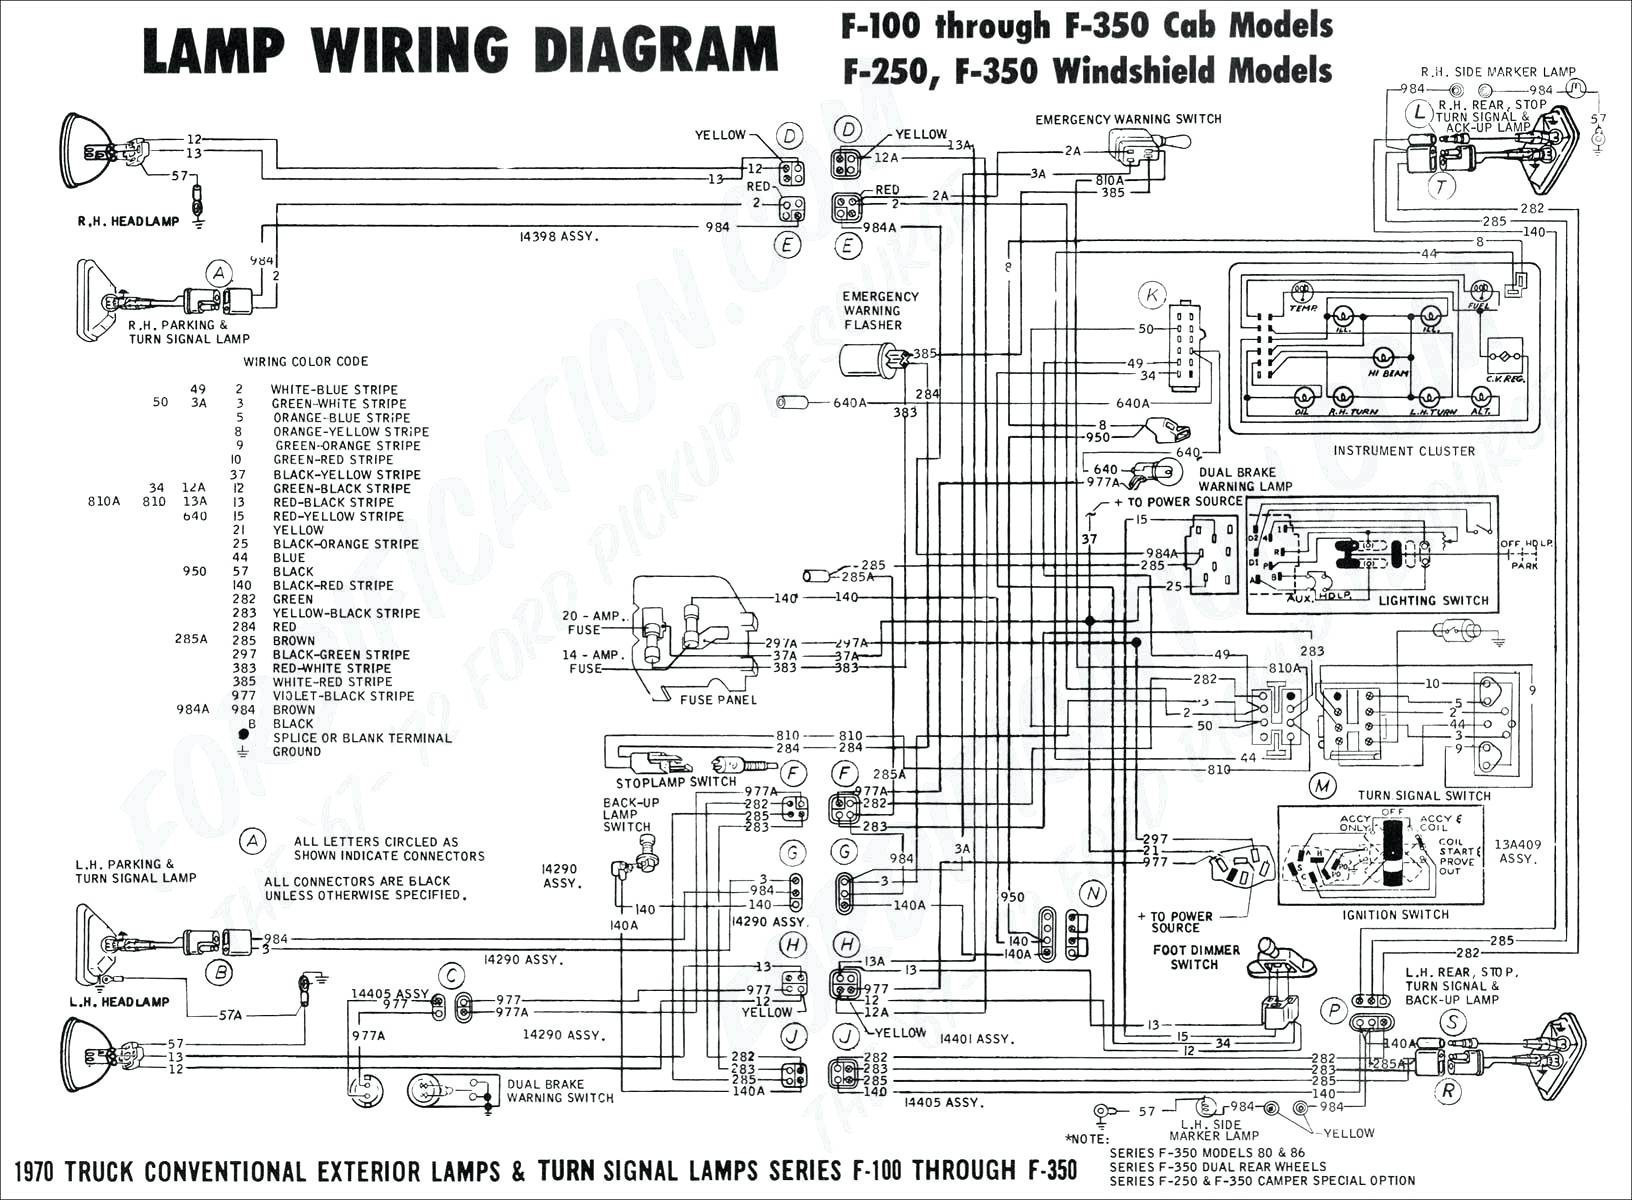 700R4 Torque Converter Lockup Wiring Diagram   Best Wiring Library - 700R4 Torque Converter Lockup Wiring Diagram